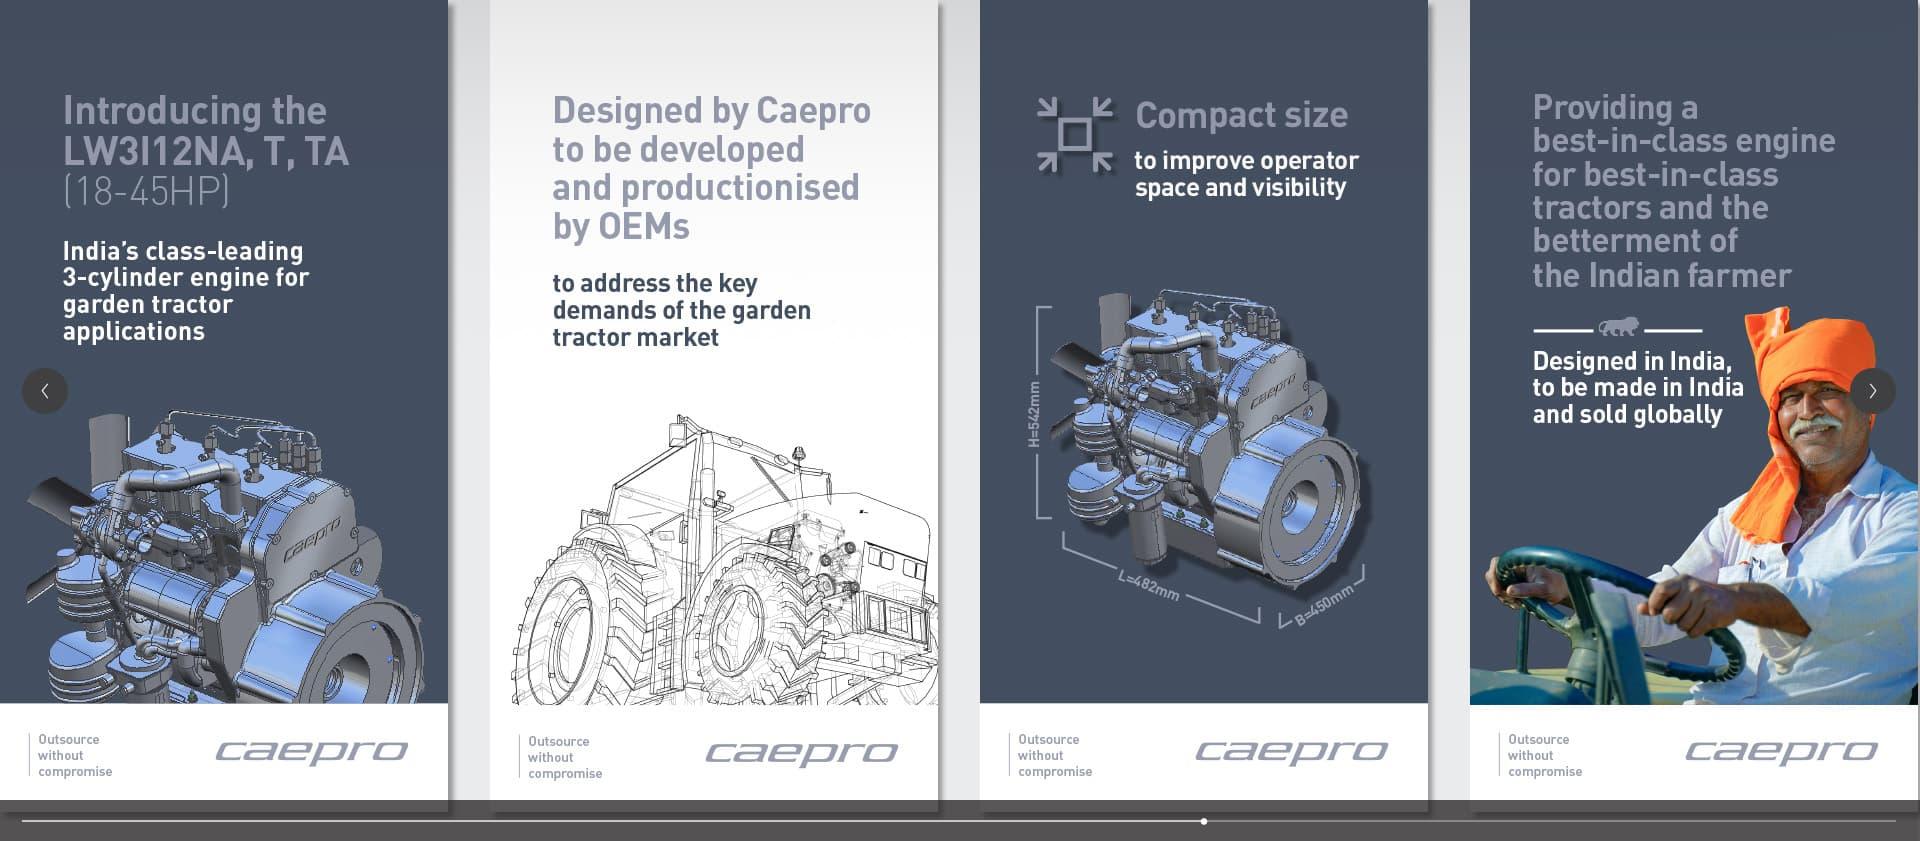 Caepro engine external